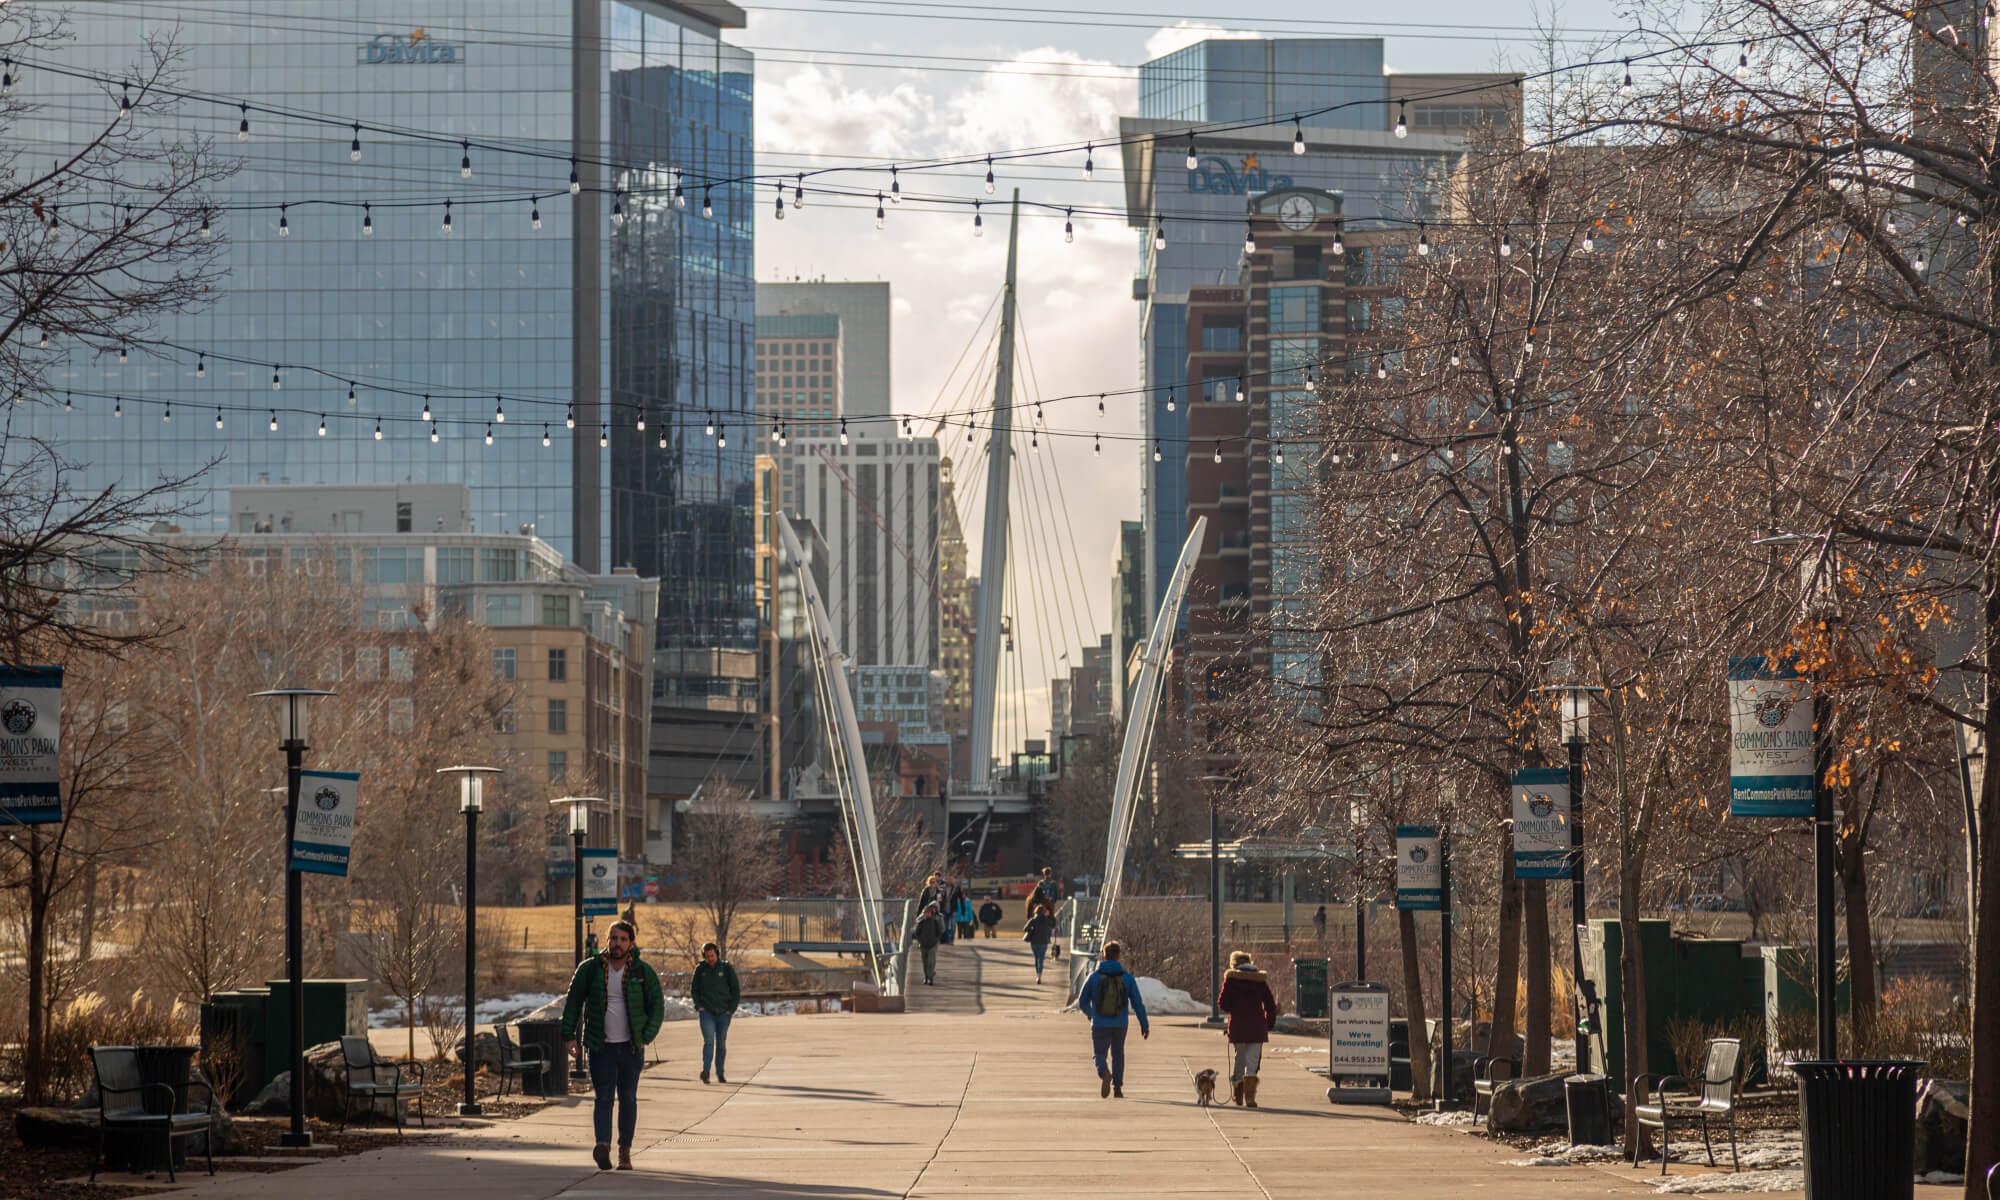 Downtown streets of Denver, Colorado